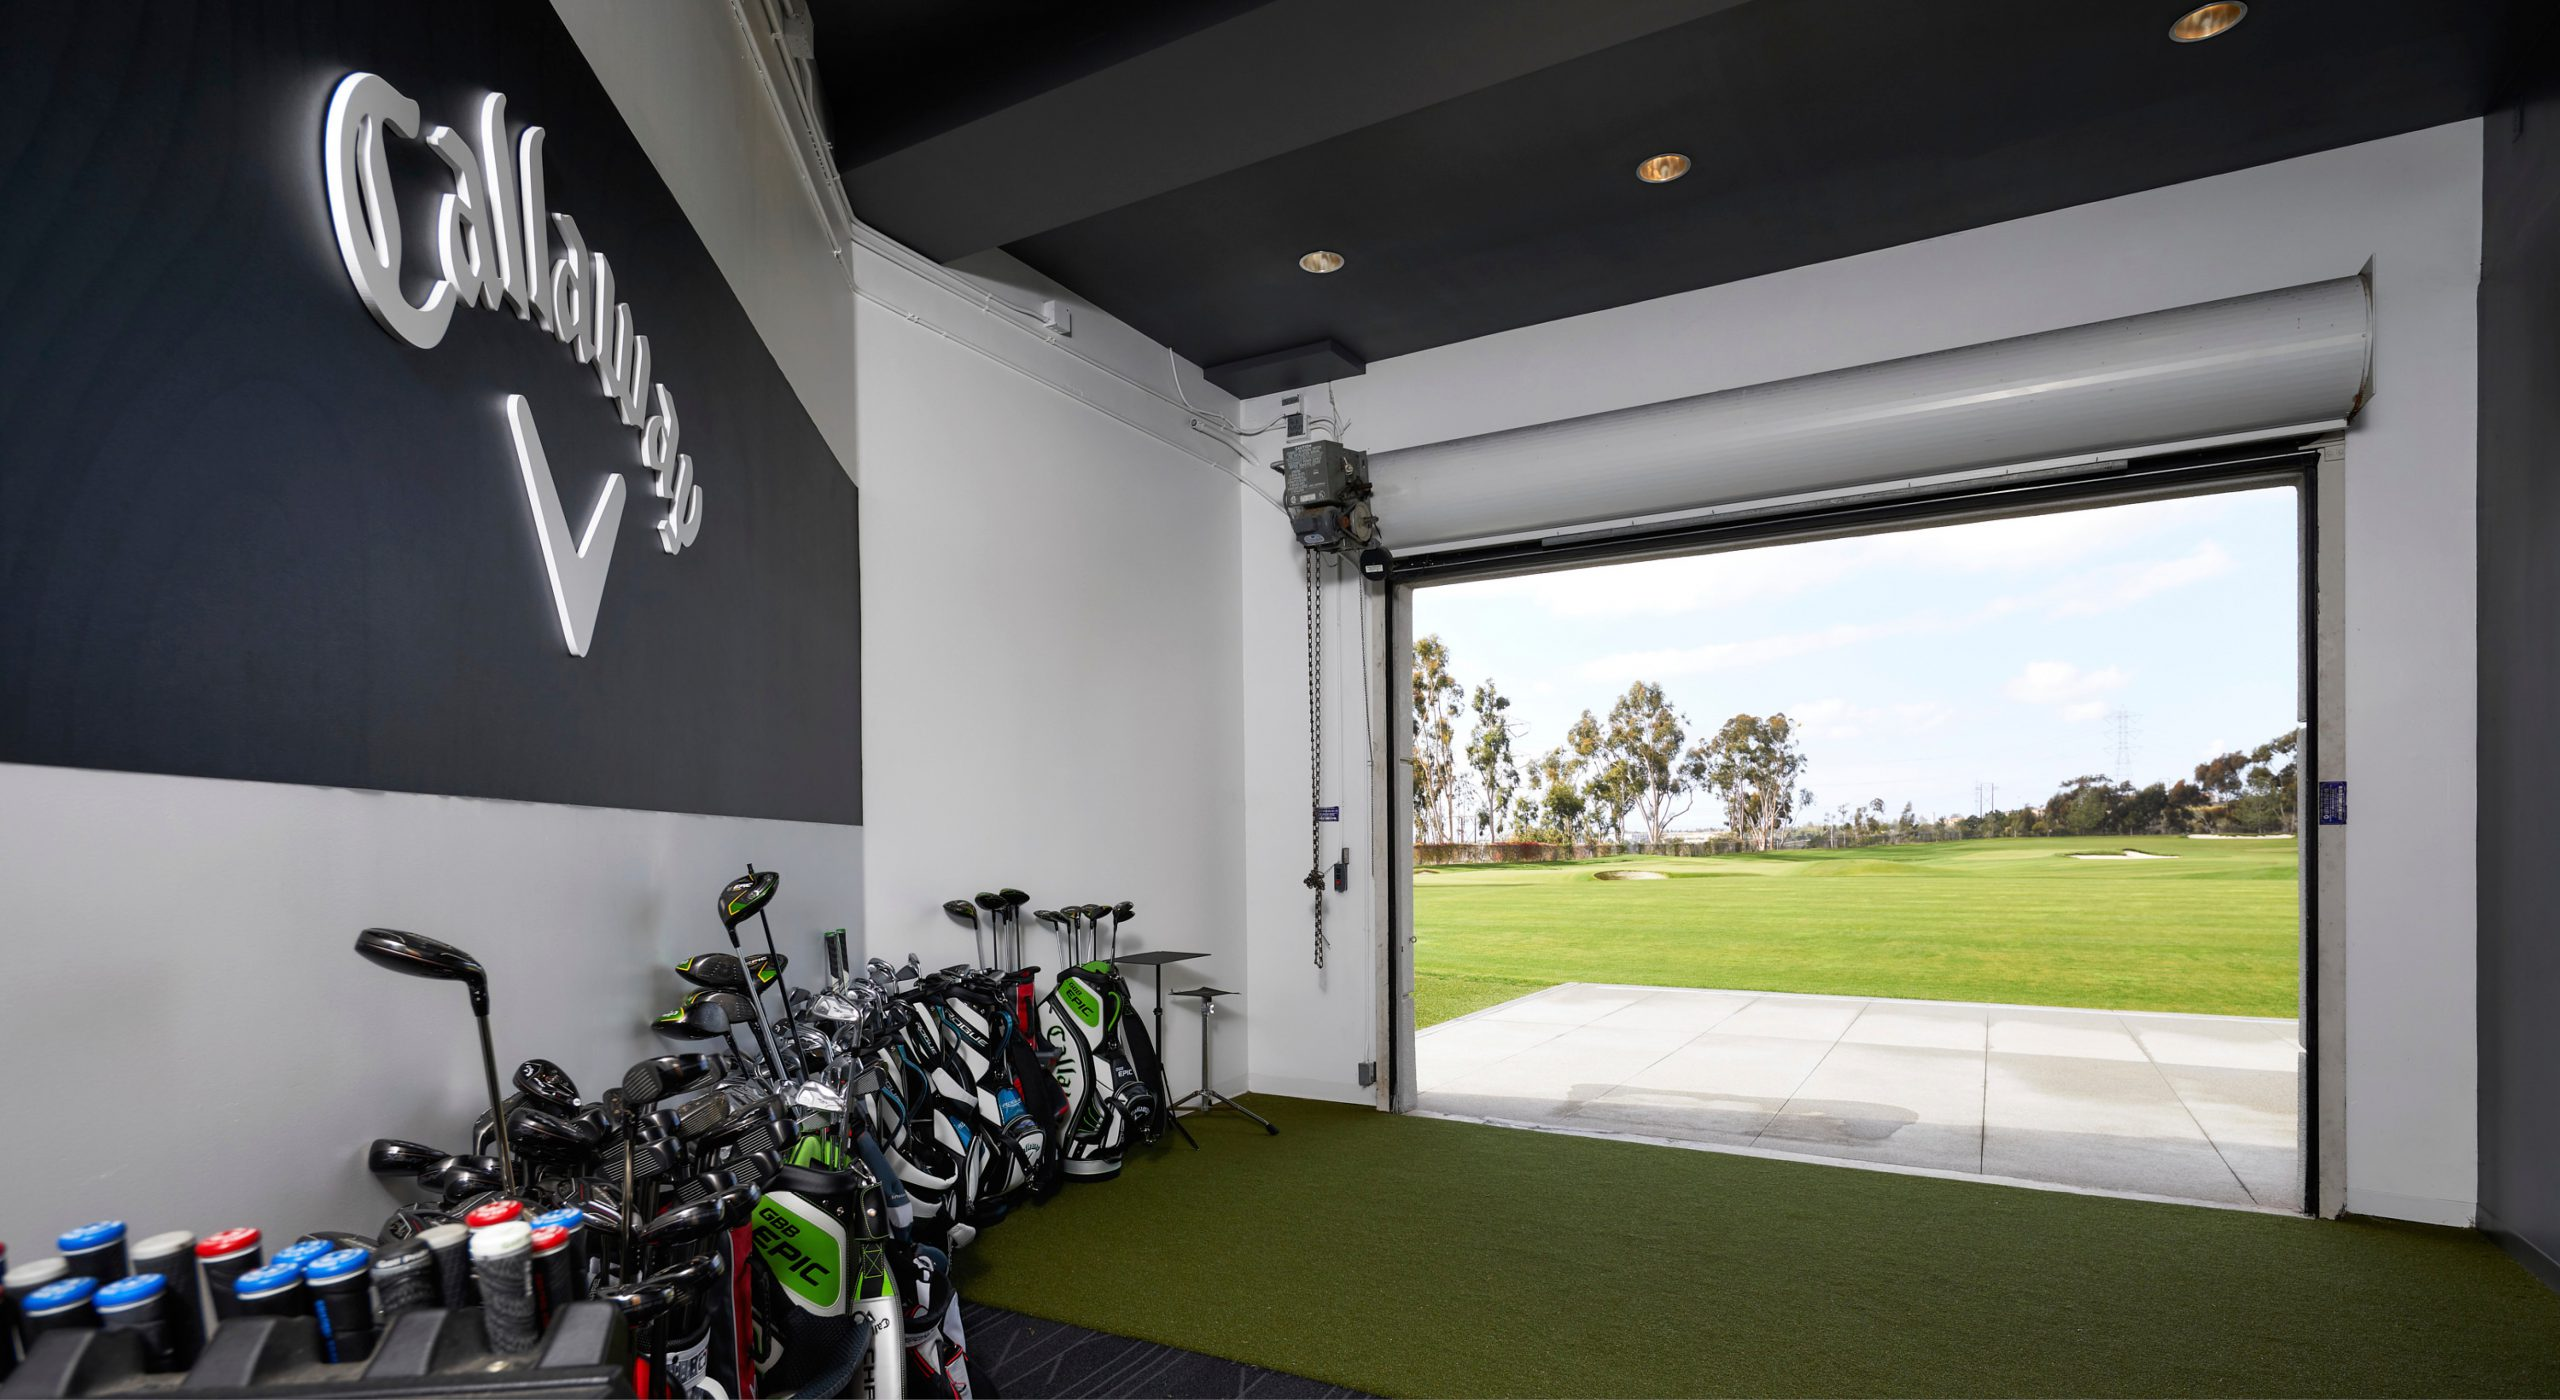 Callaway Golf Performance Center golf area